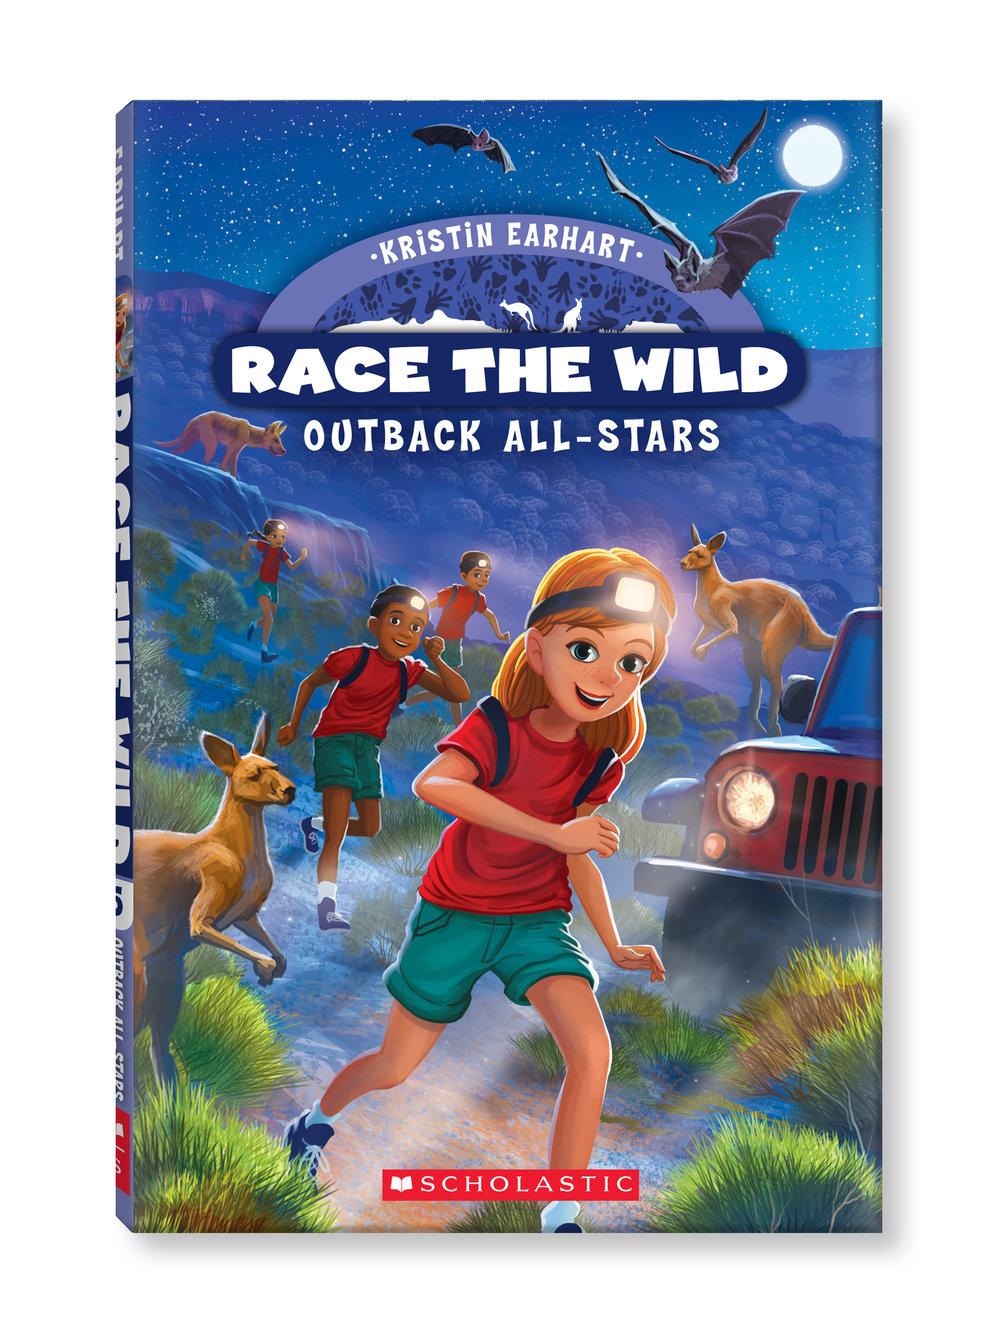 racethewild_5.jpg